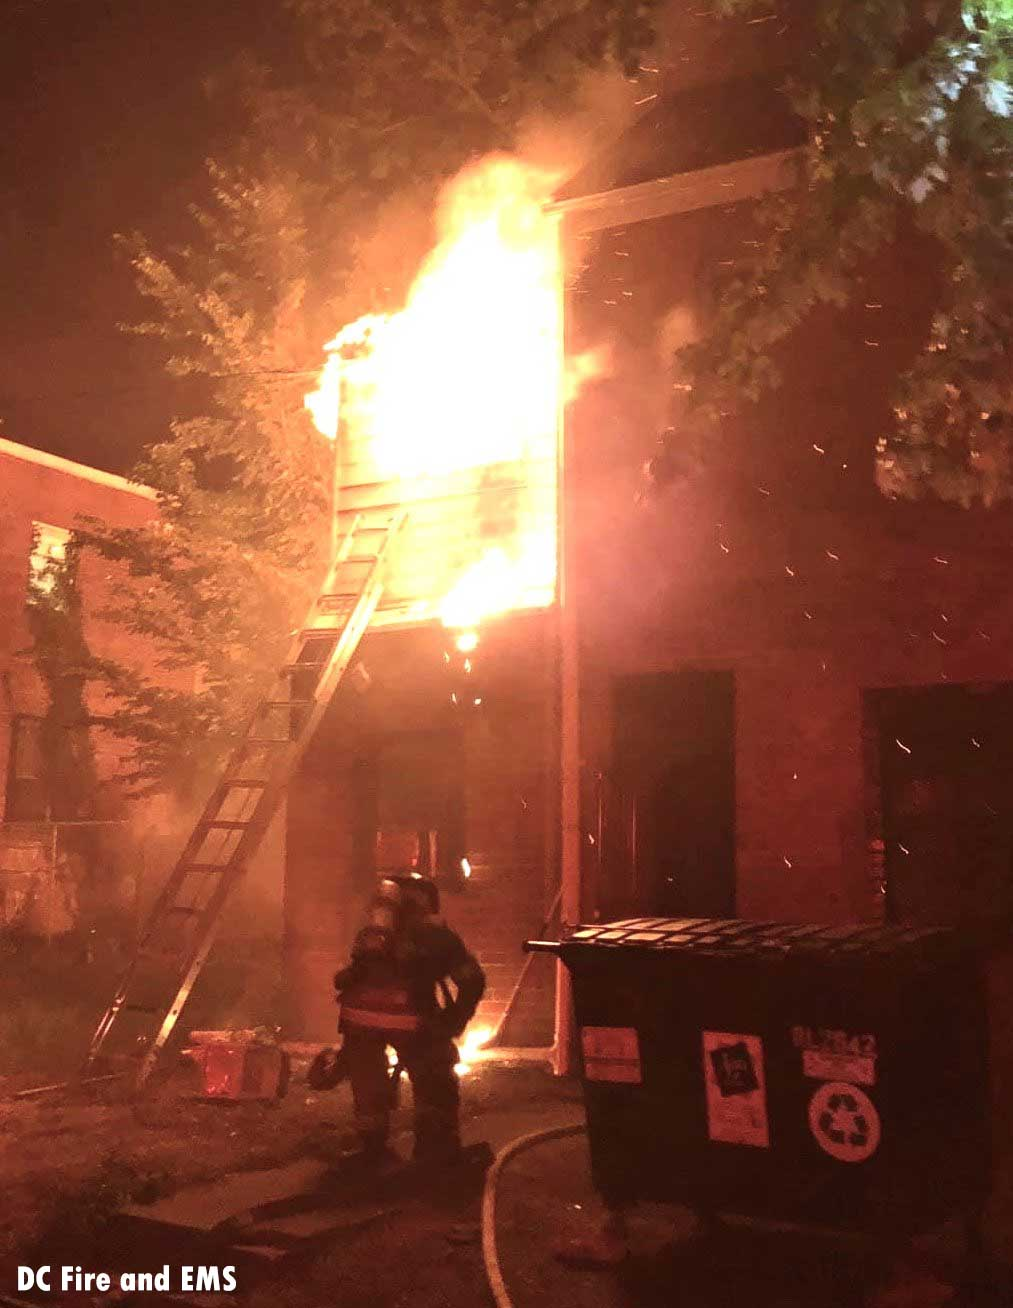 A D.C. firefighter advances toward a building as flames shoot from it